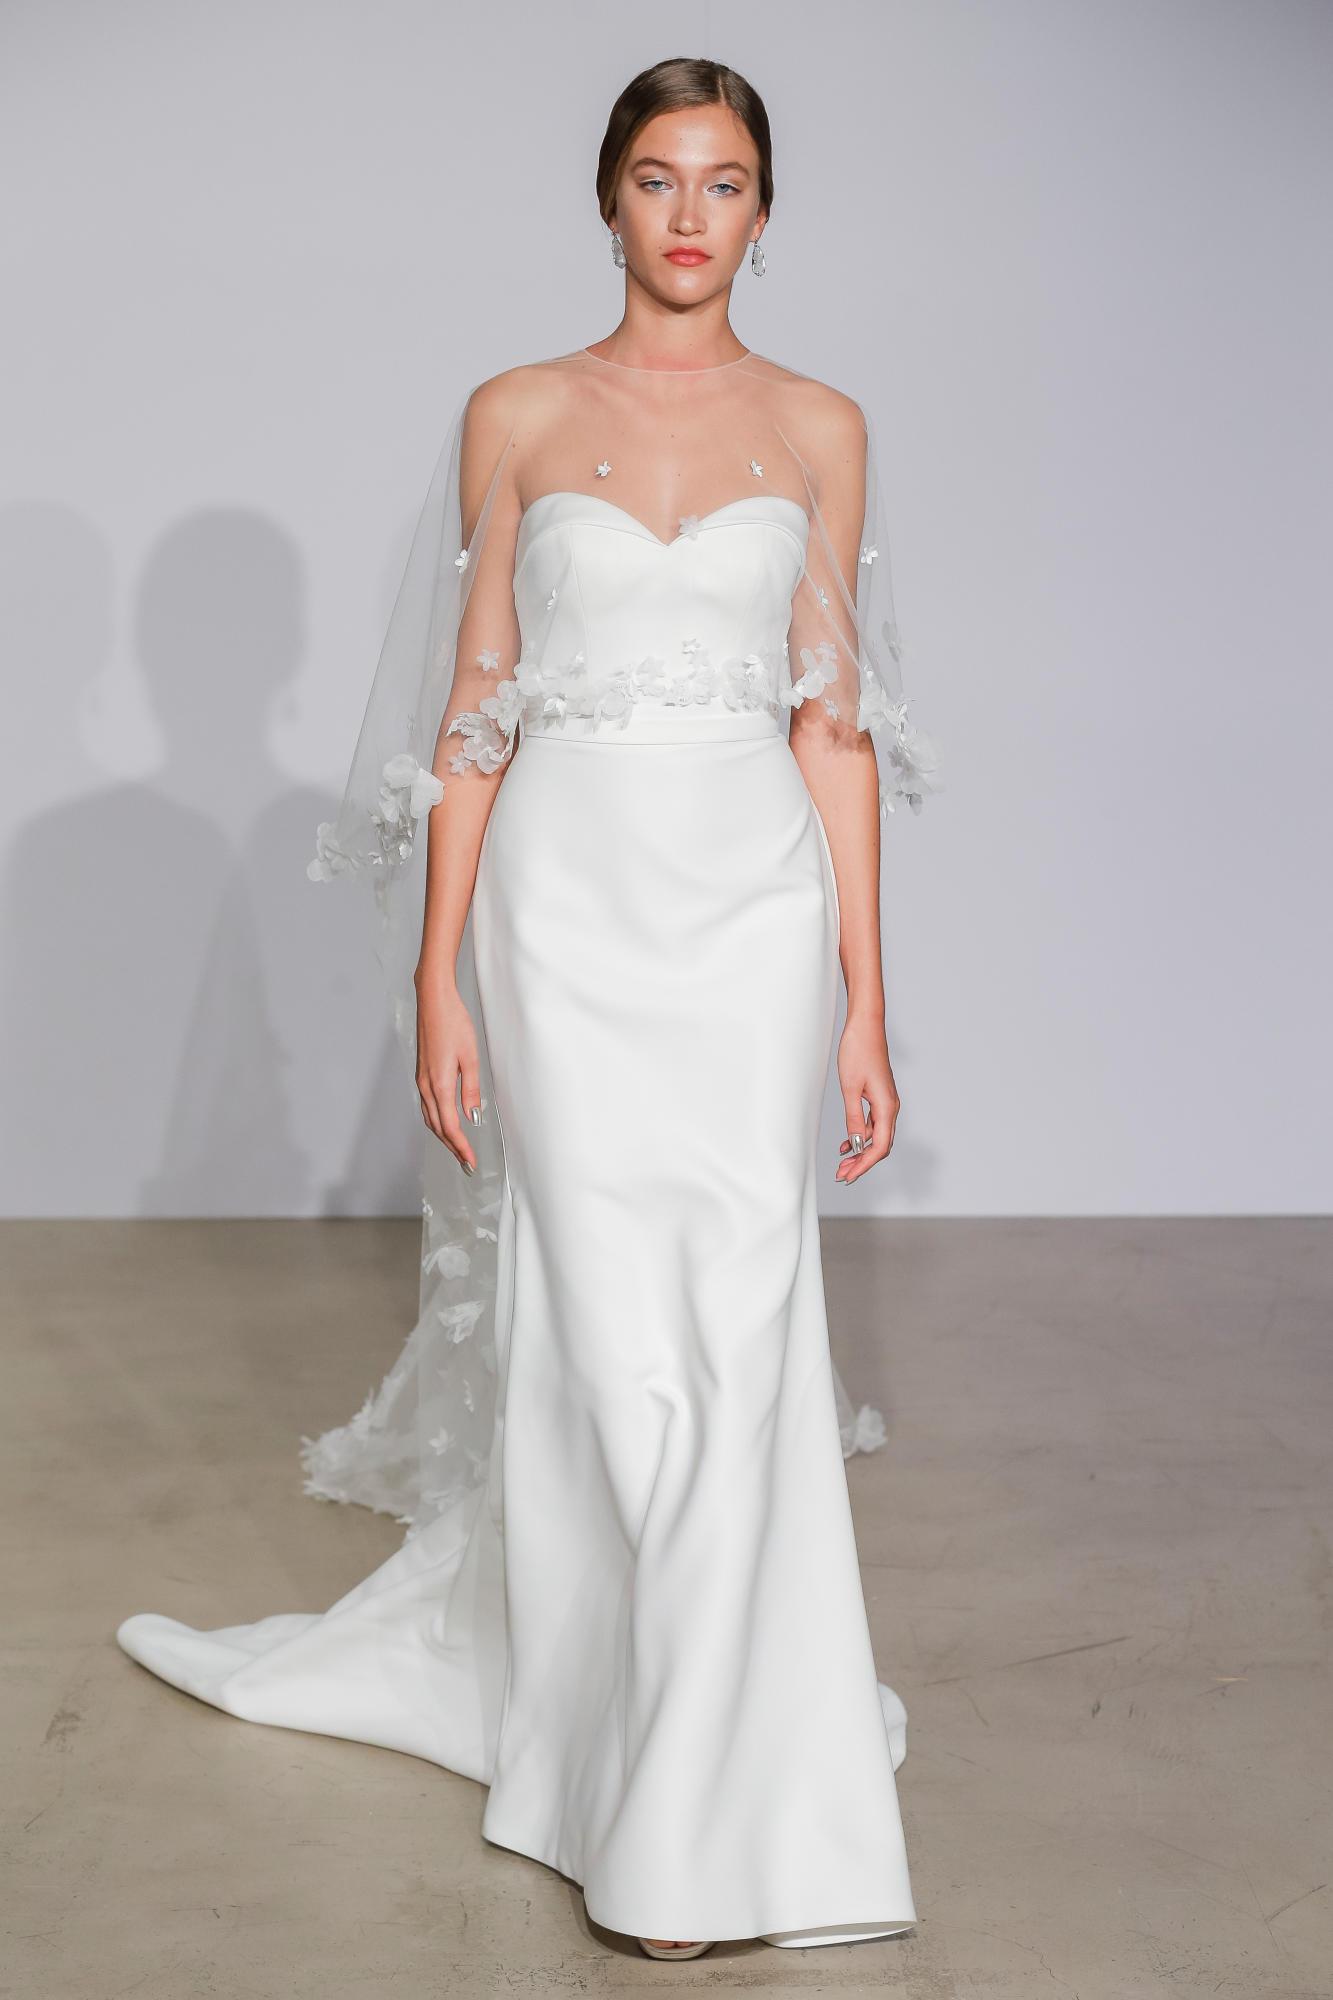 2018-Wedding-Dress-Trend-The-Stylish-and-Modern-Cape